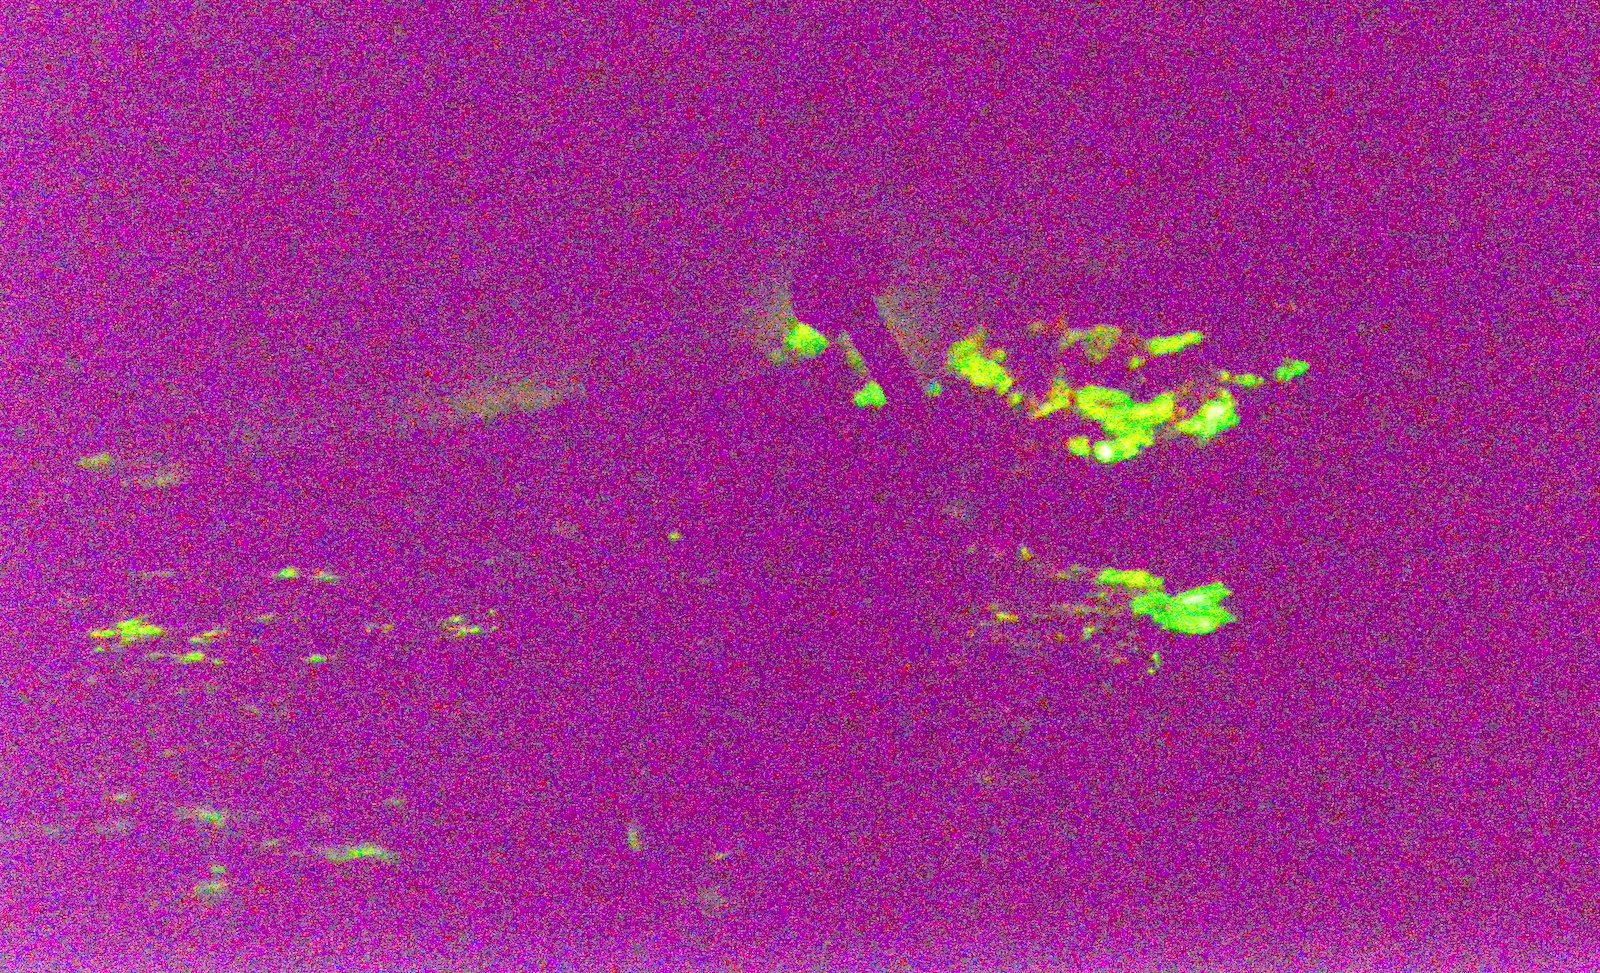 Mycean haematopus mycelium glowing. Photo by Damon Tighe